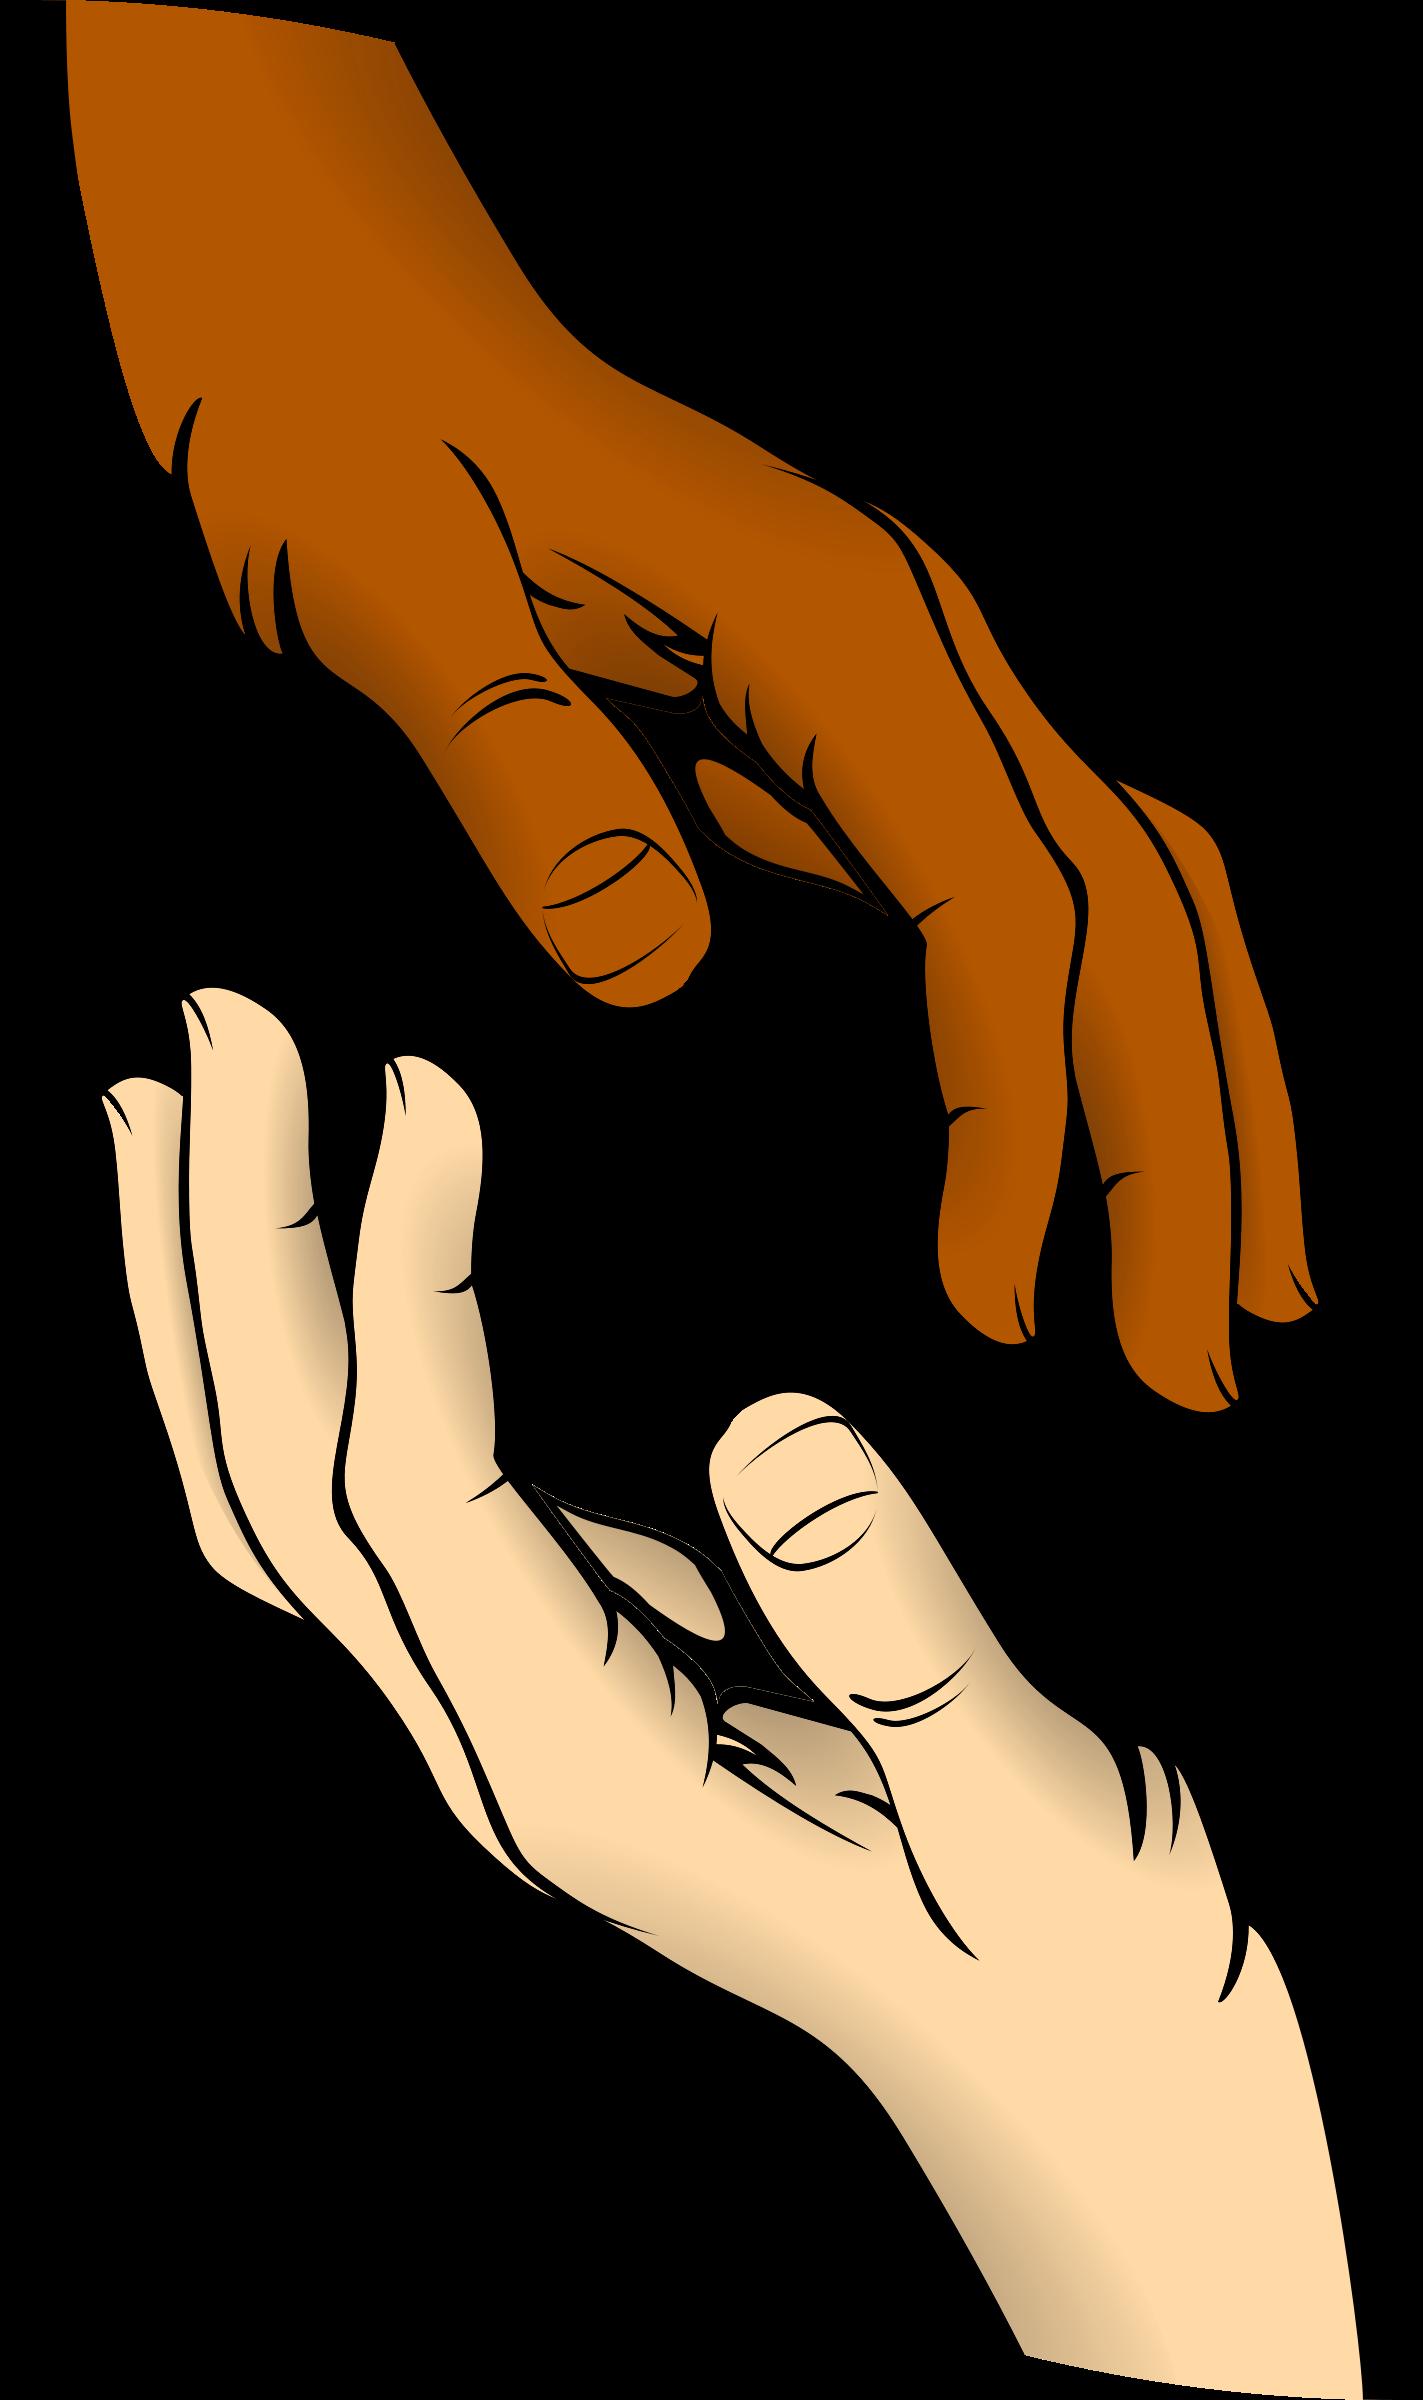 Hand cartoon clipart svg transparent download Hand Clip Art Free | Clipart Panda - Free Clipart Images svg transparent download